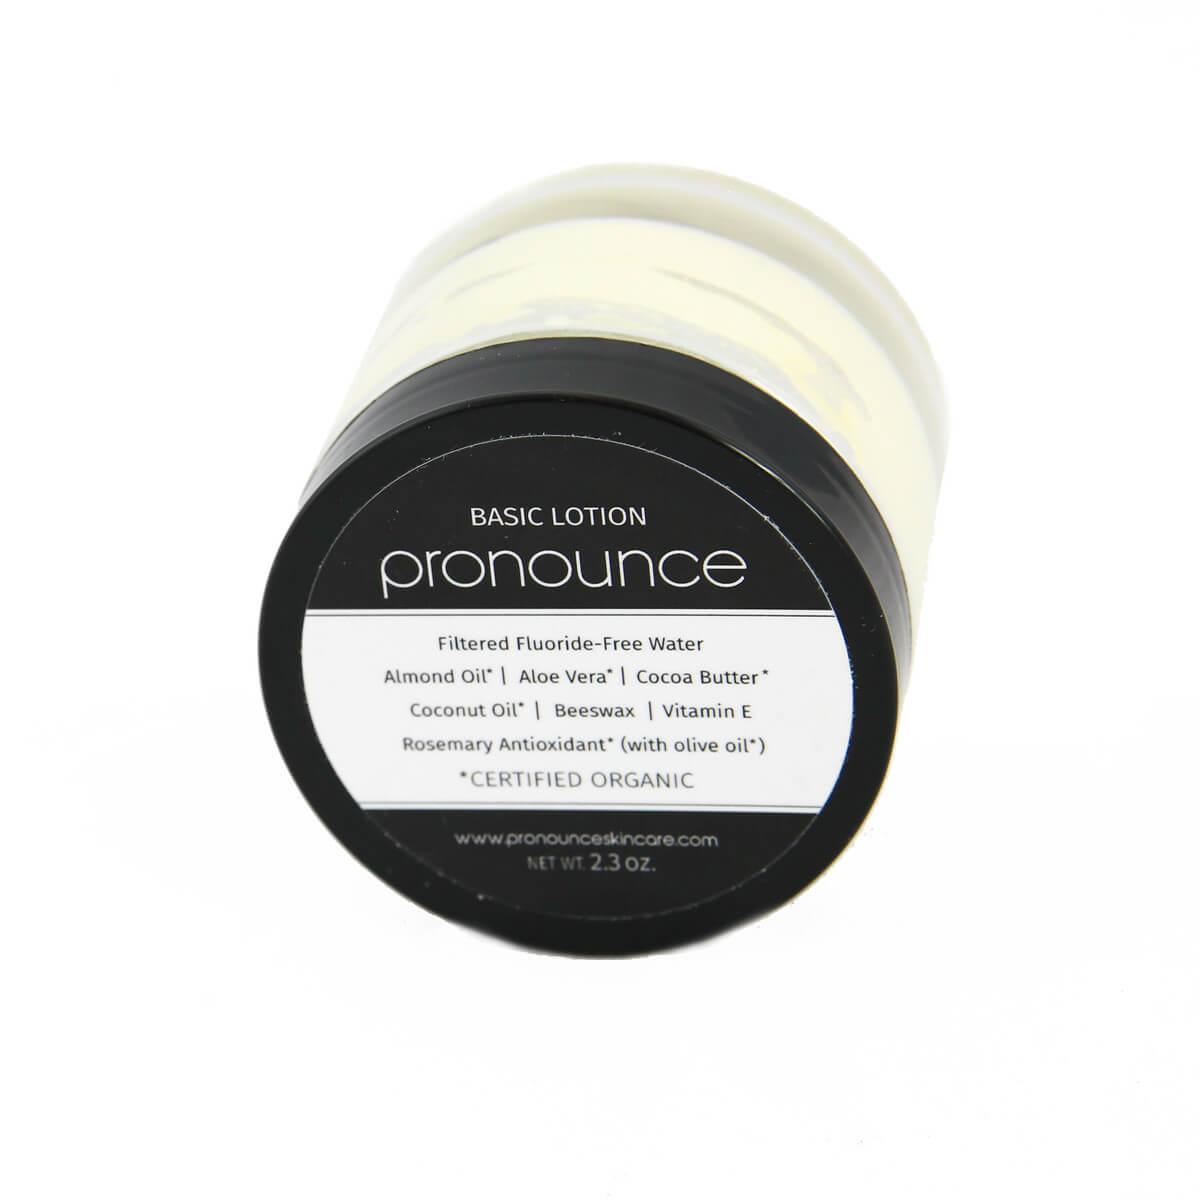 Basic Lotion 2.3oz Pronounce Skincare & Herbal Boutique